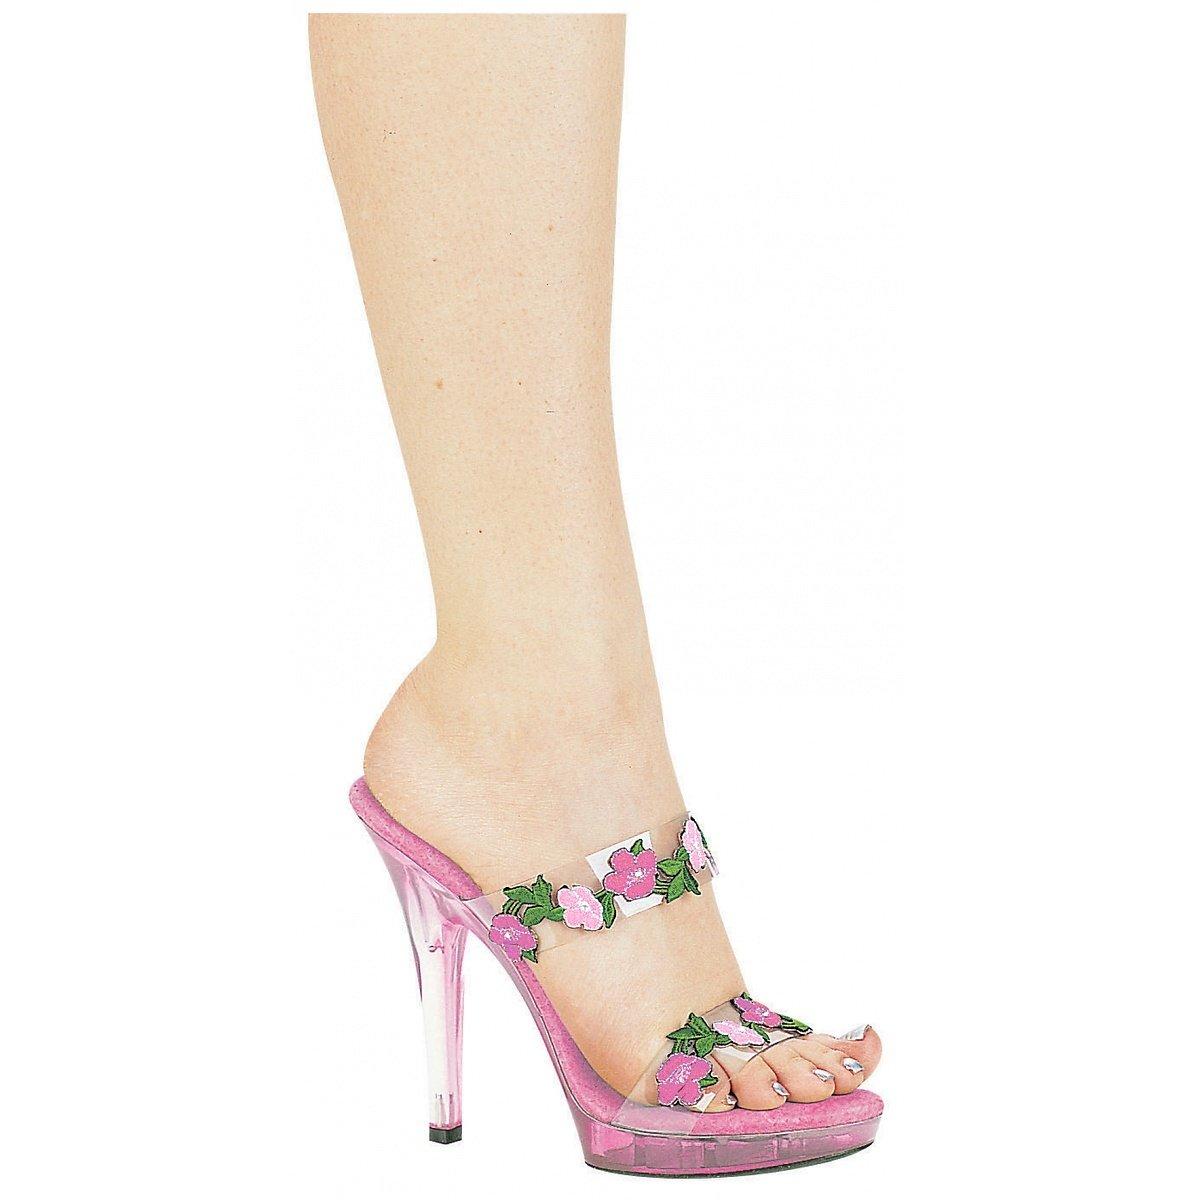 Amazon ellie shoes 5 heel flower sandal heeled sandals mightylinksfo